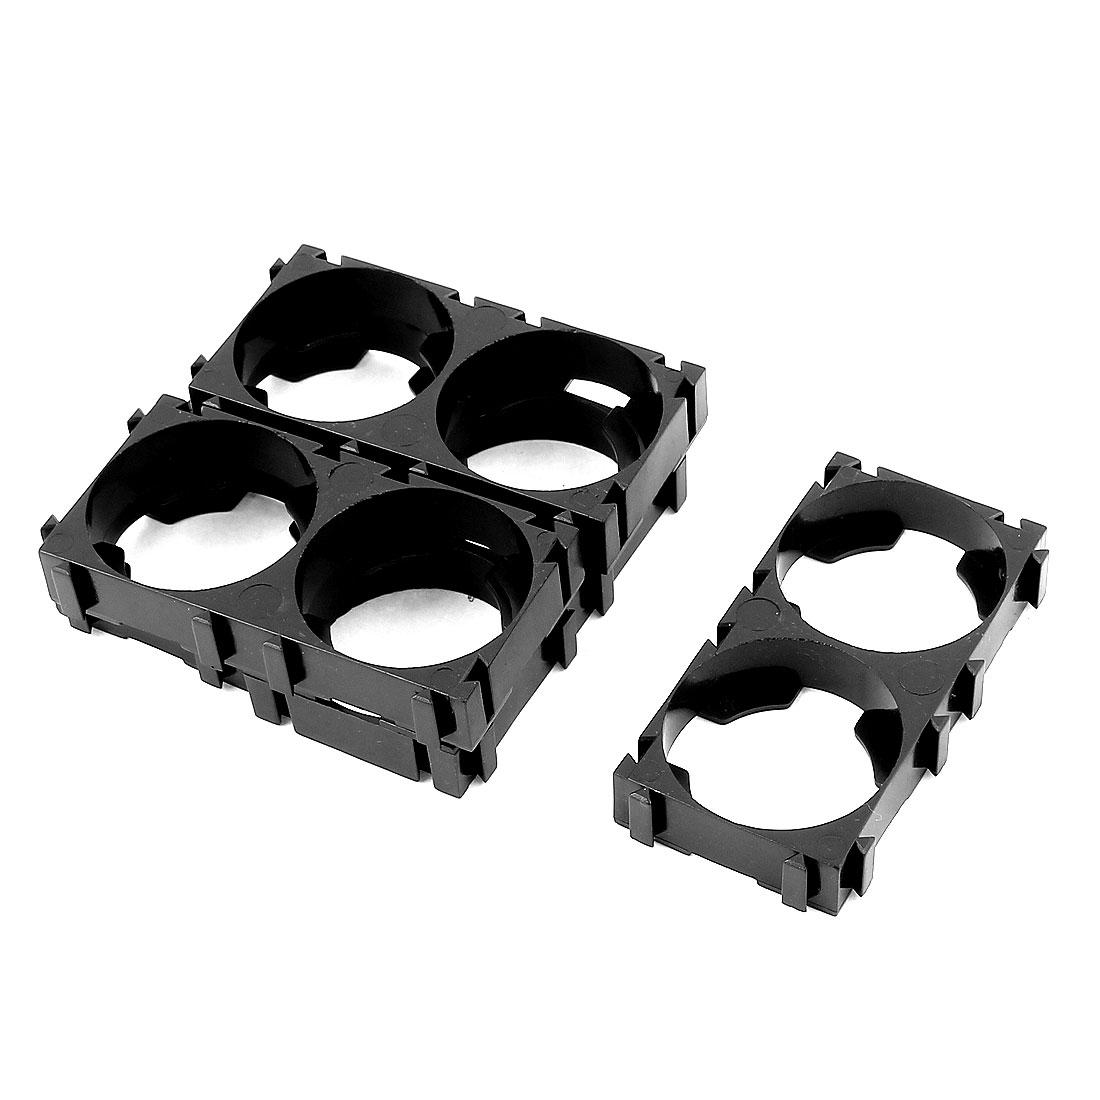 5 Pcs 26650 Lithium Cell Battery Dual Holder Bracket for DIY Battery Pack